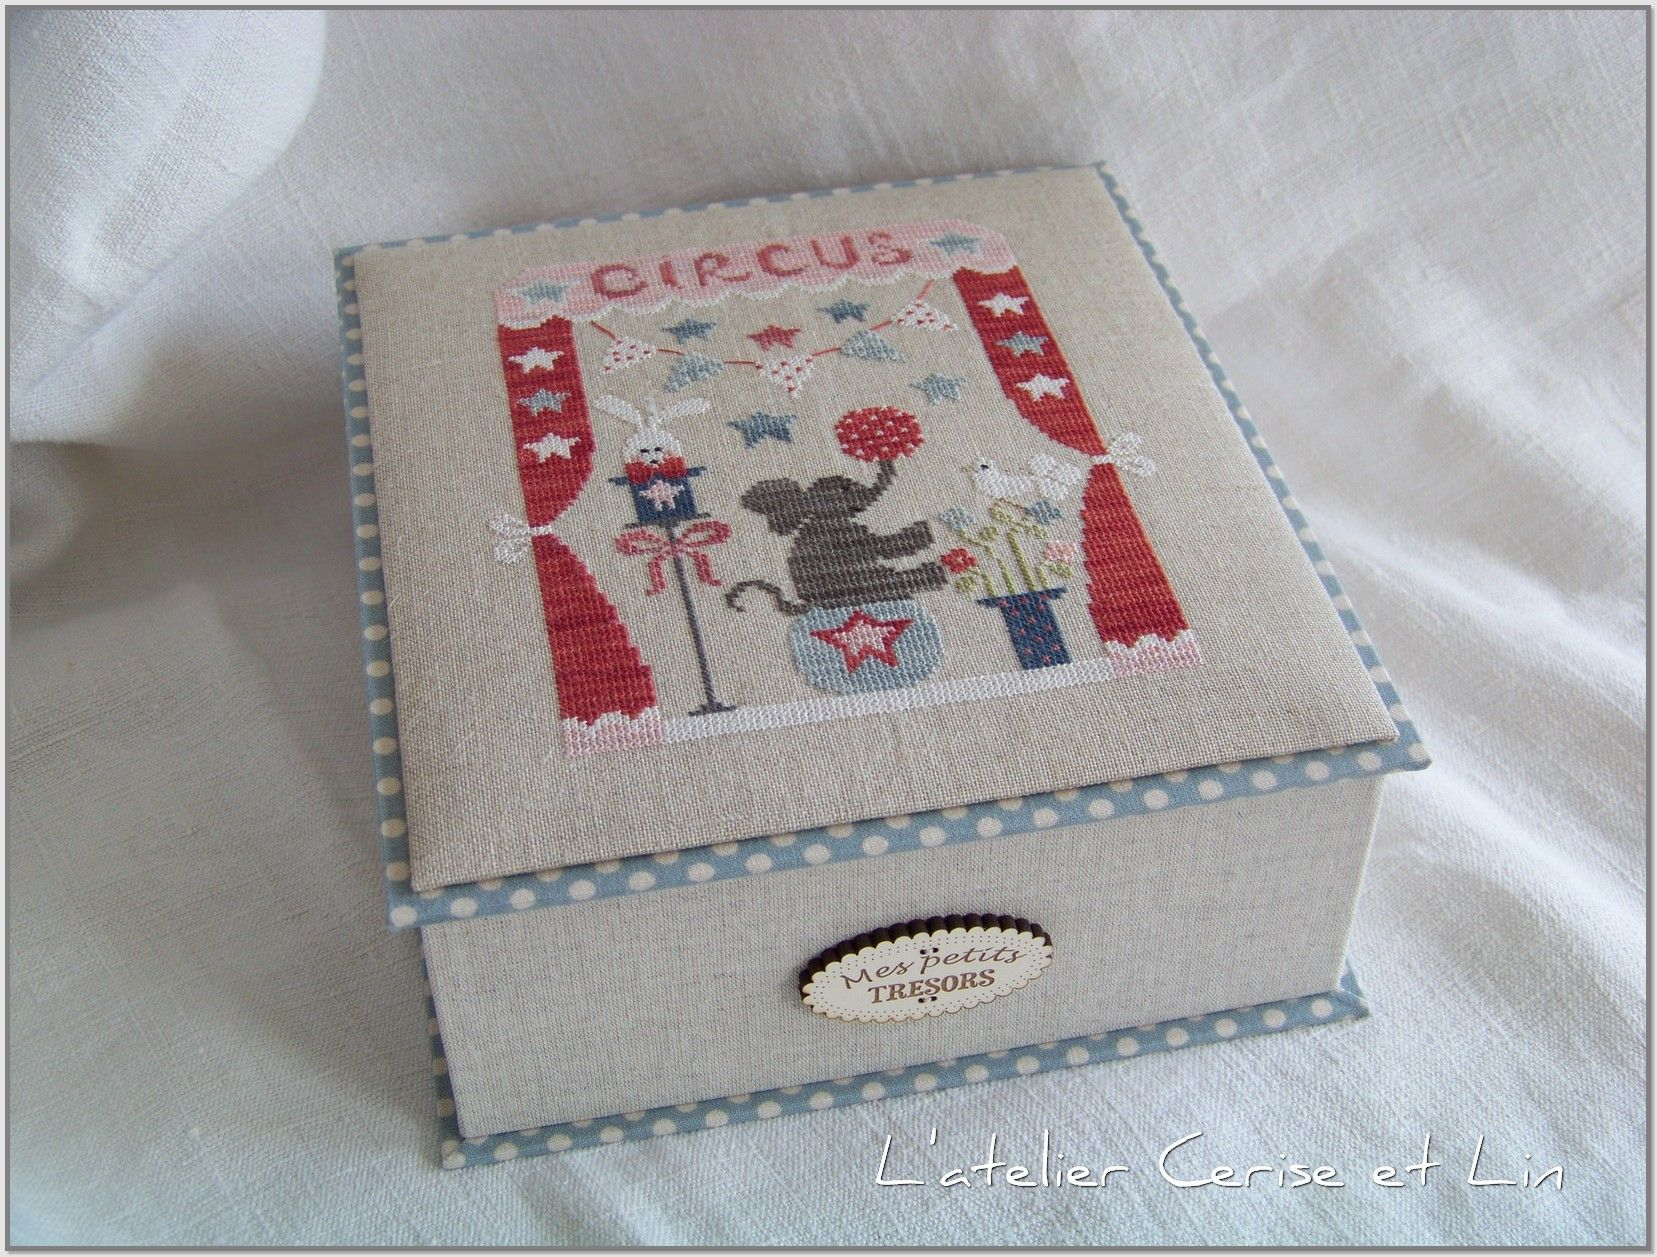 atelier cerise et lin tralala cartonaje pinterest box cross stitch and stitch. Black Bedroom Furniture Sets. Home Design Ideas